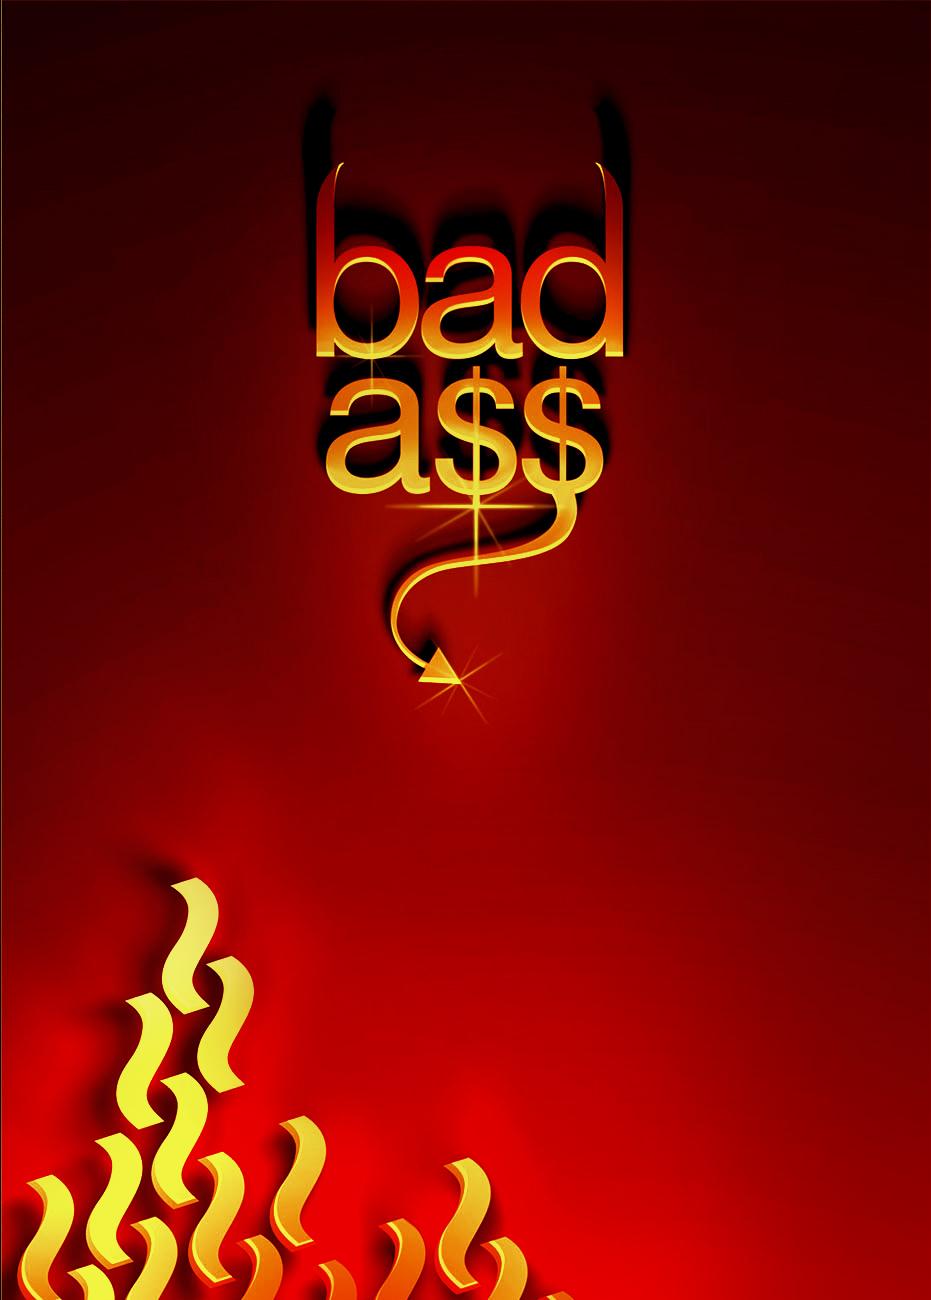 7 Bad AssB.jpg